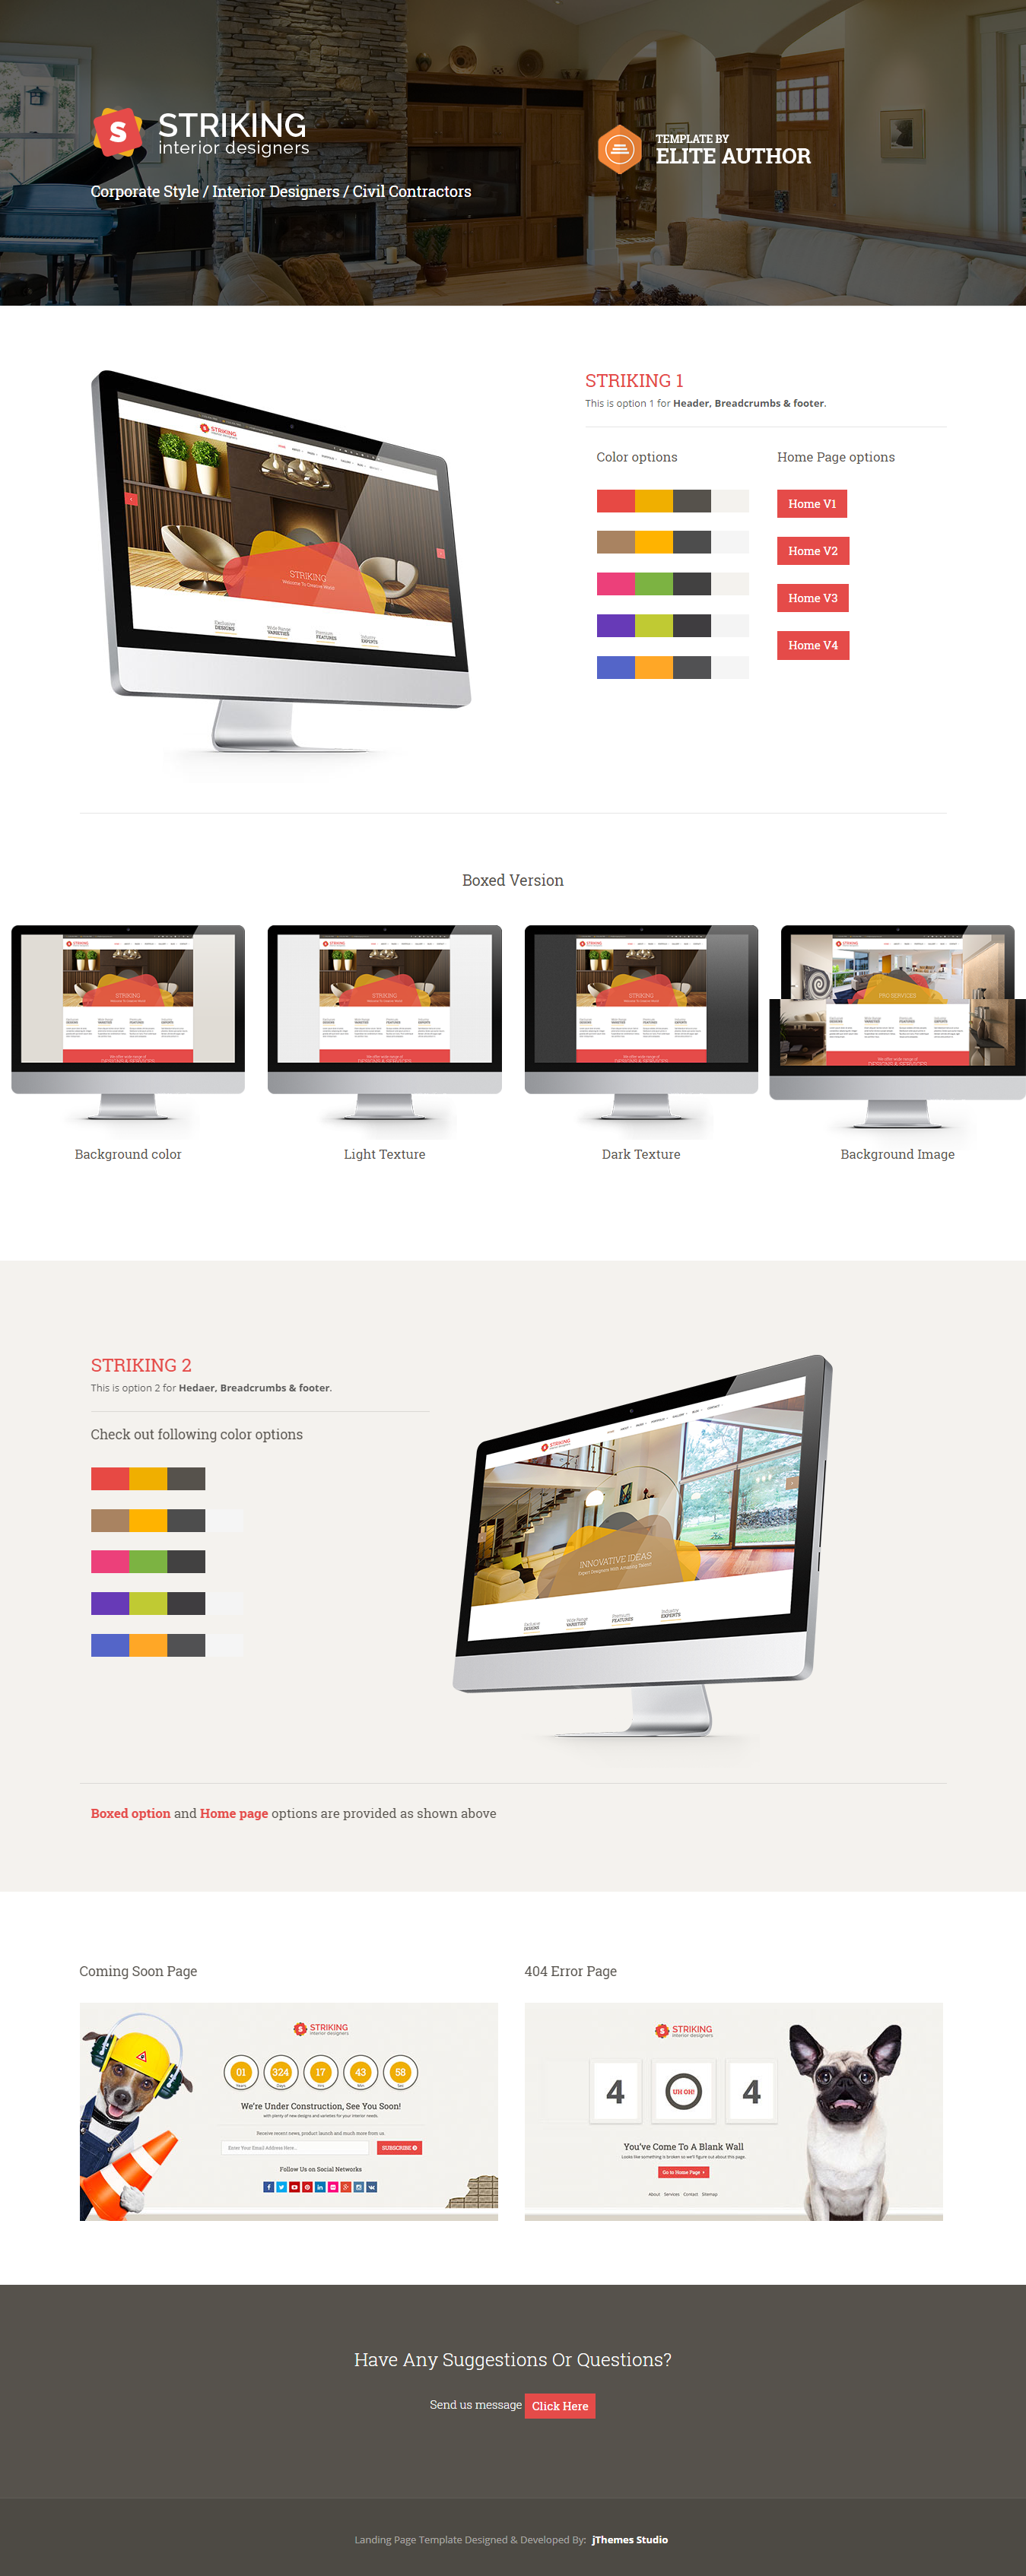 striking best premium interior design wordpress theme - 10+ Best Premium Interior Design WordPress Themes